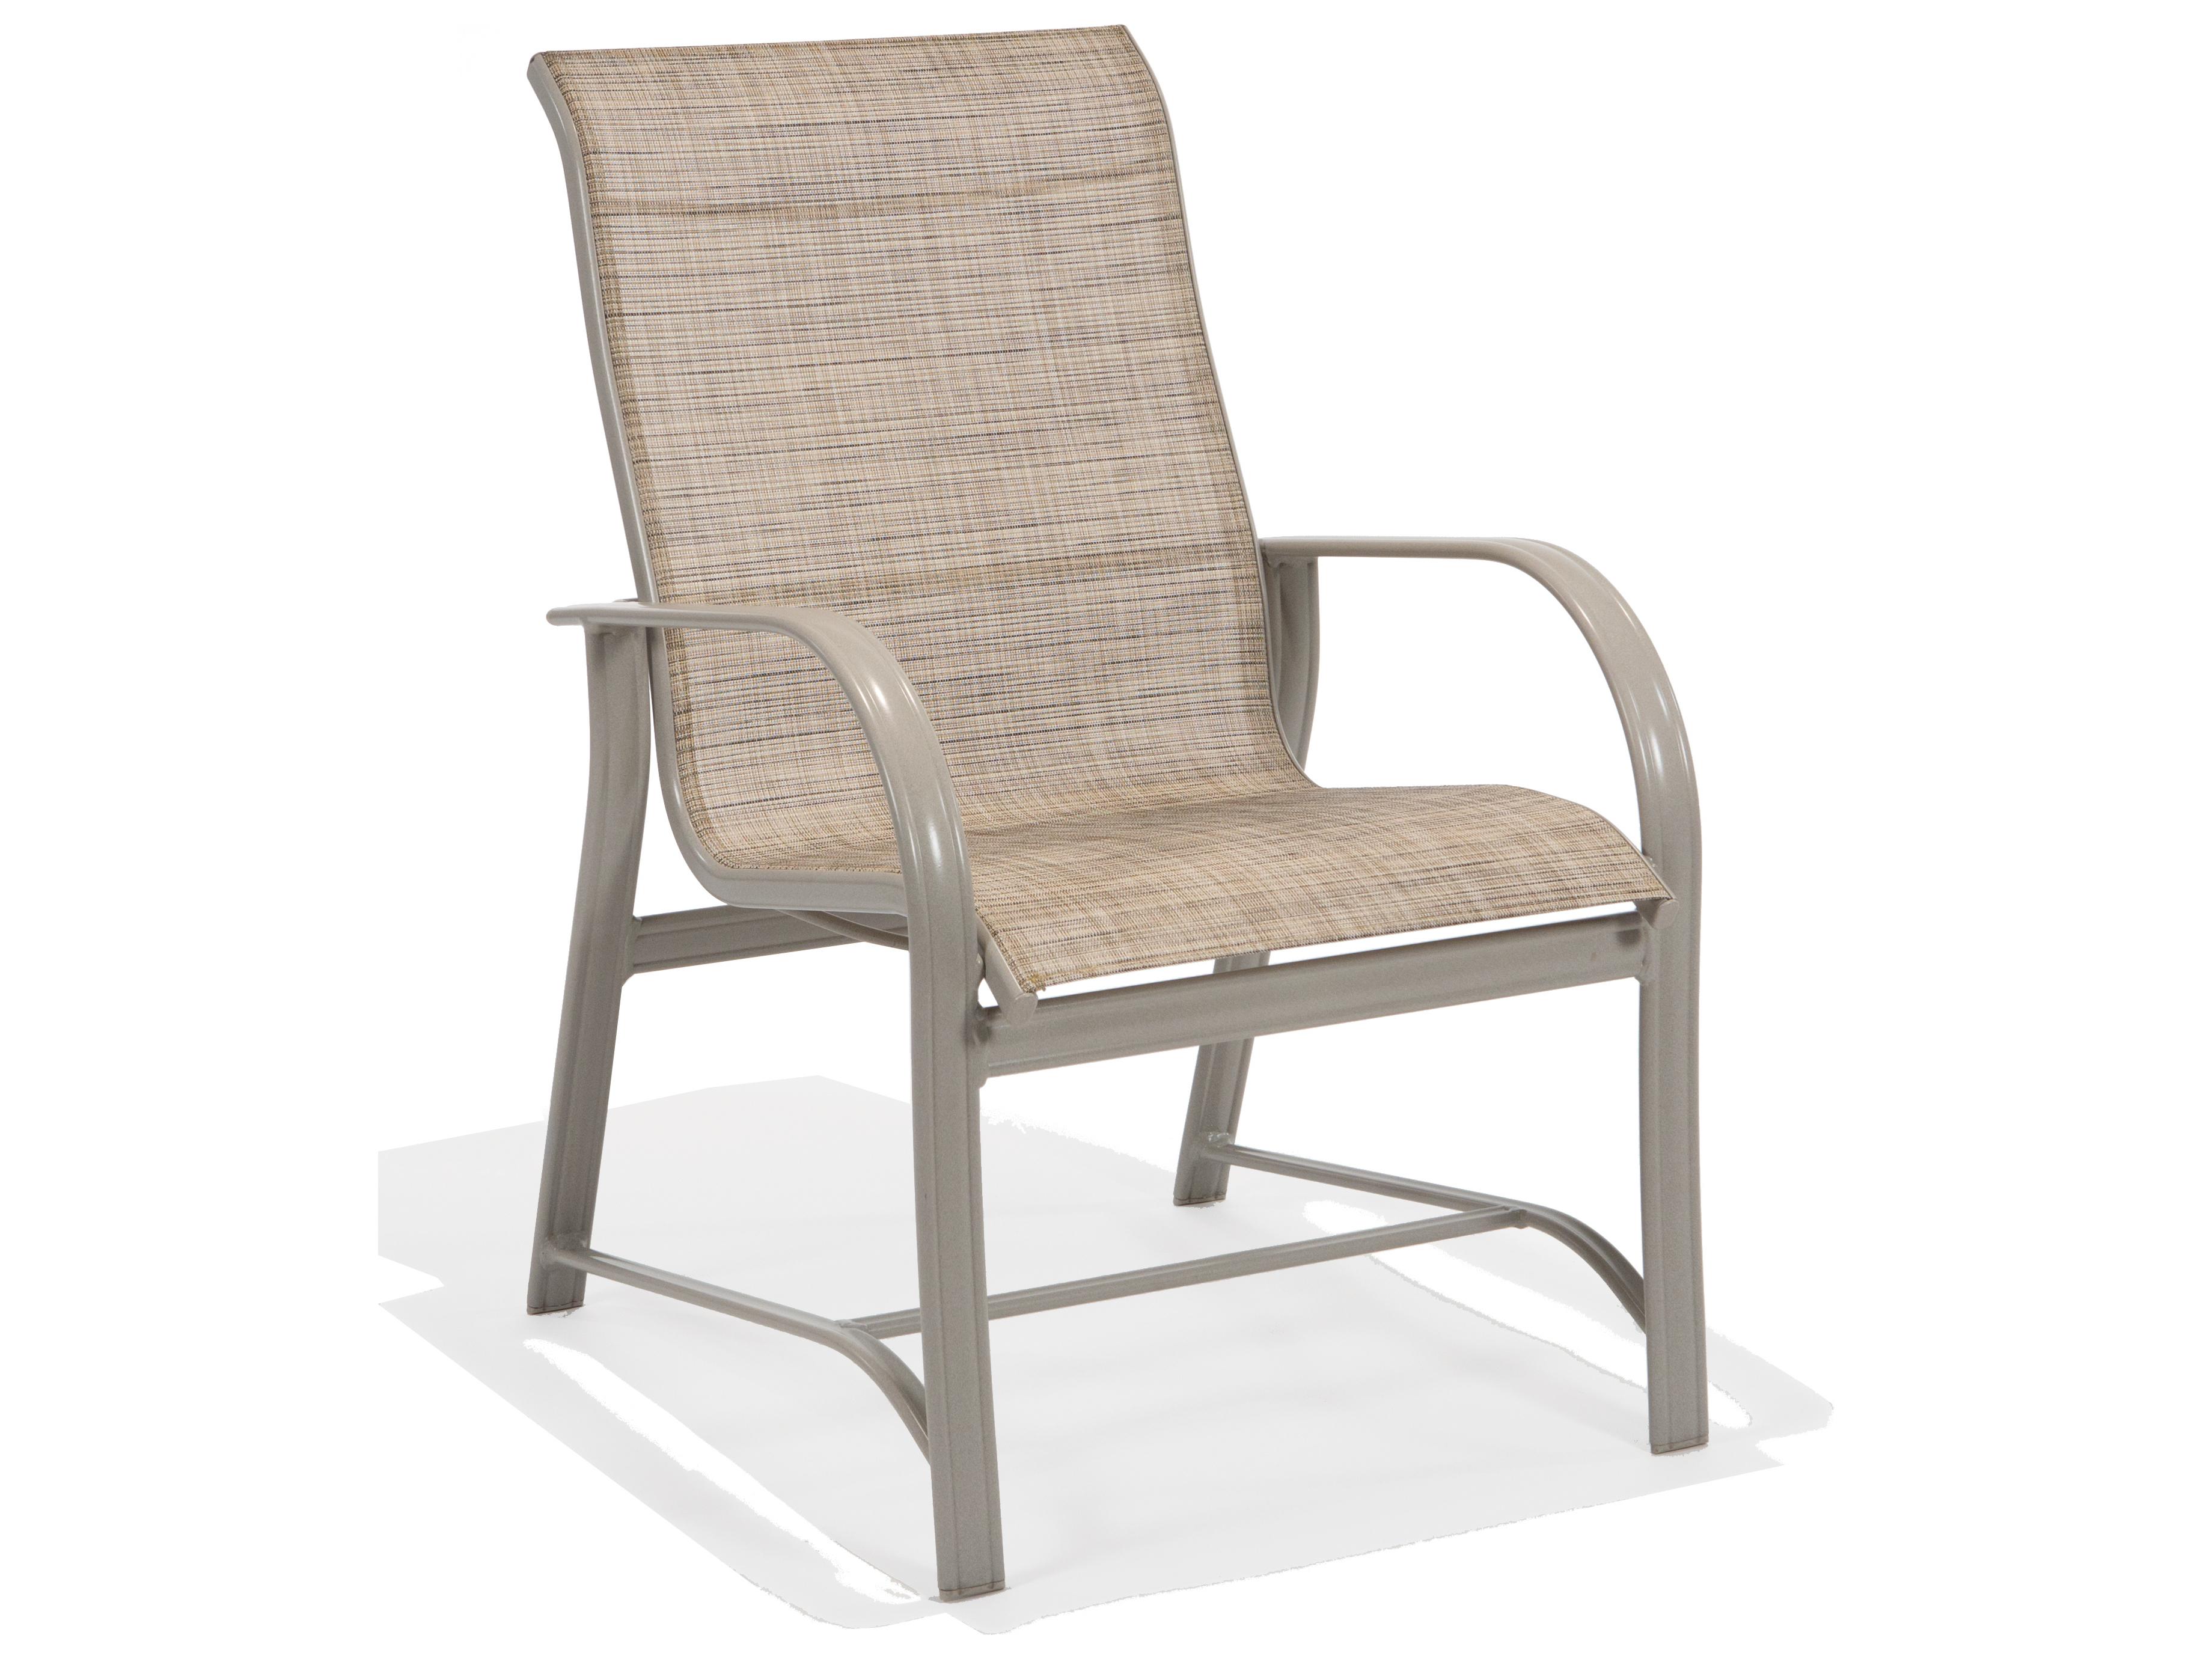 Winston Mayfair Sling Aluminum High Back Arm Dining Chair